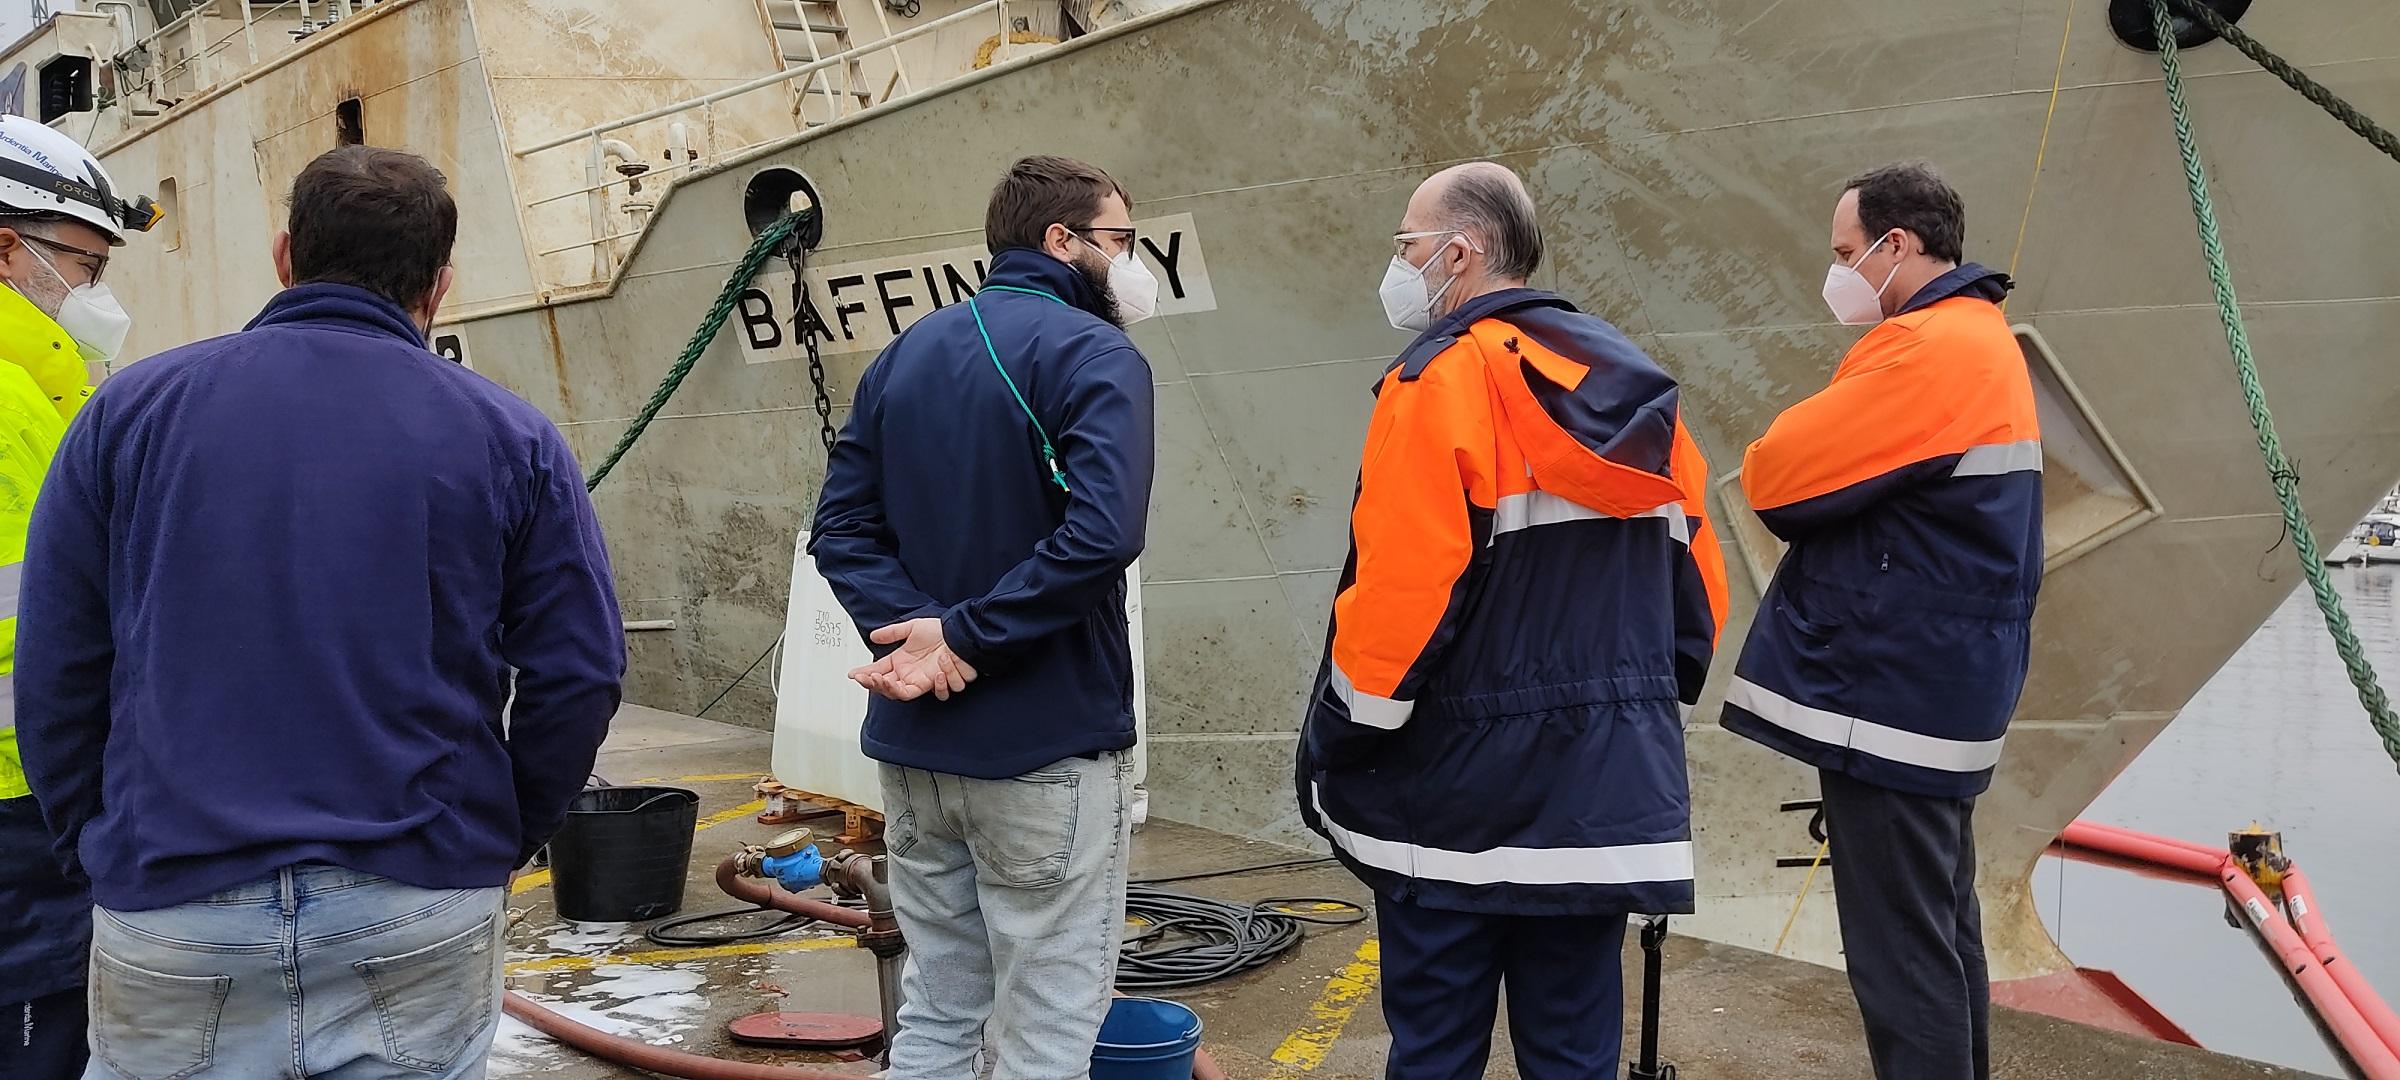 El barco hundido en Vigo, reflotado